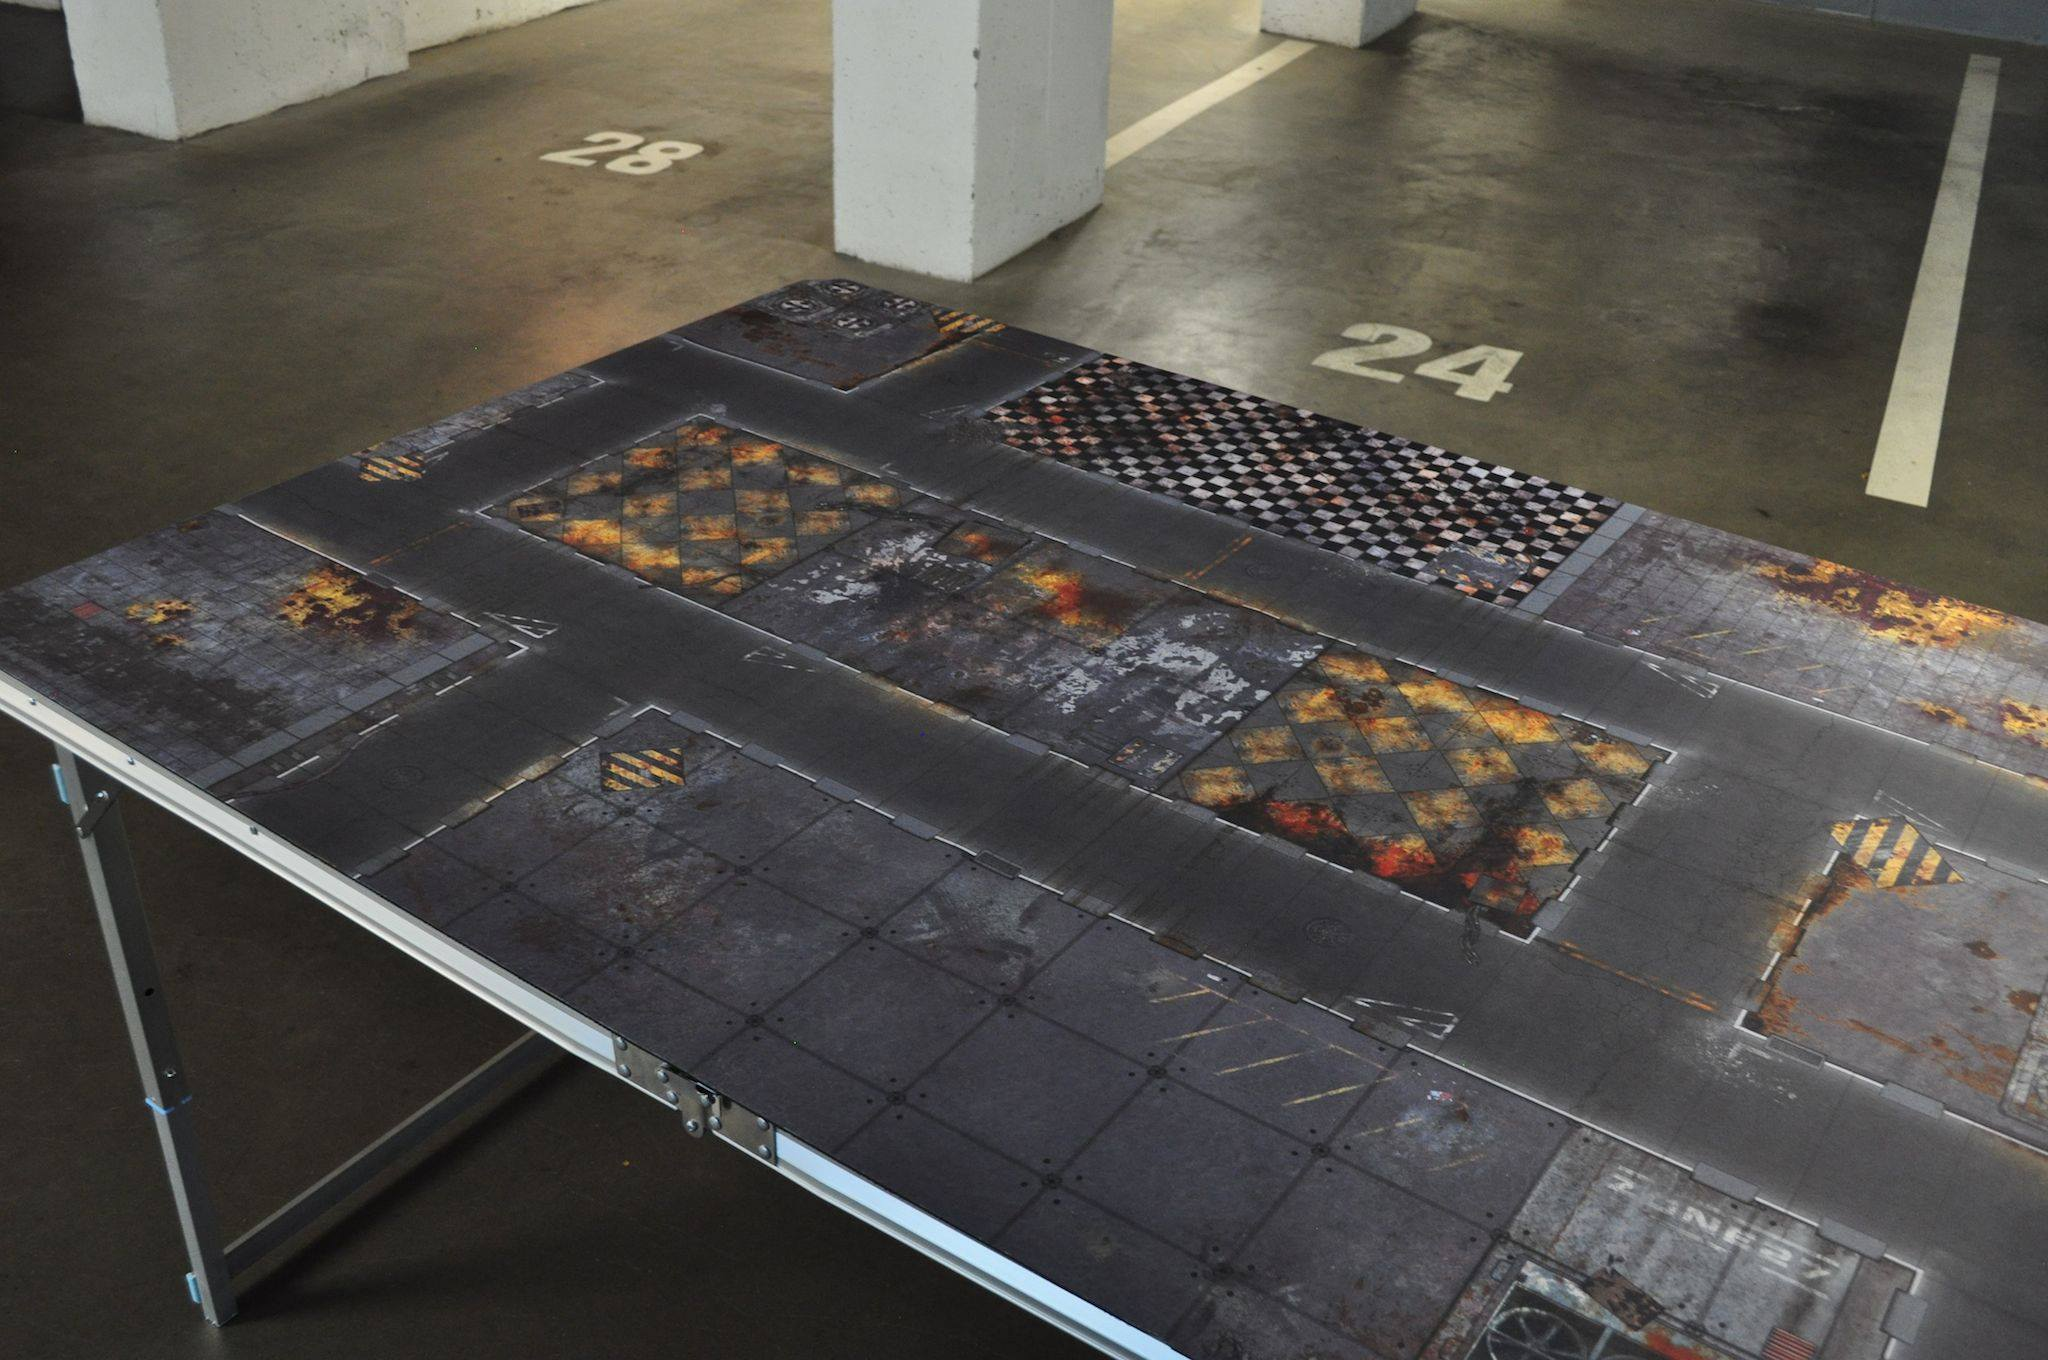 gamemat eu portabler spieltisch br ckenkopf. Black Bedroom Furniture Sets. Home Design Ideas